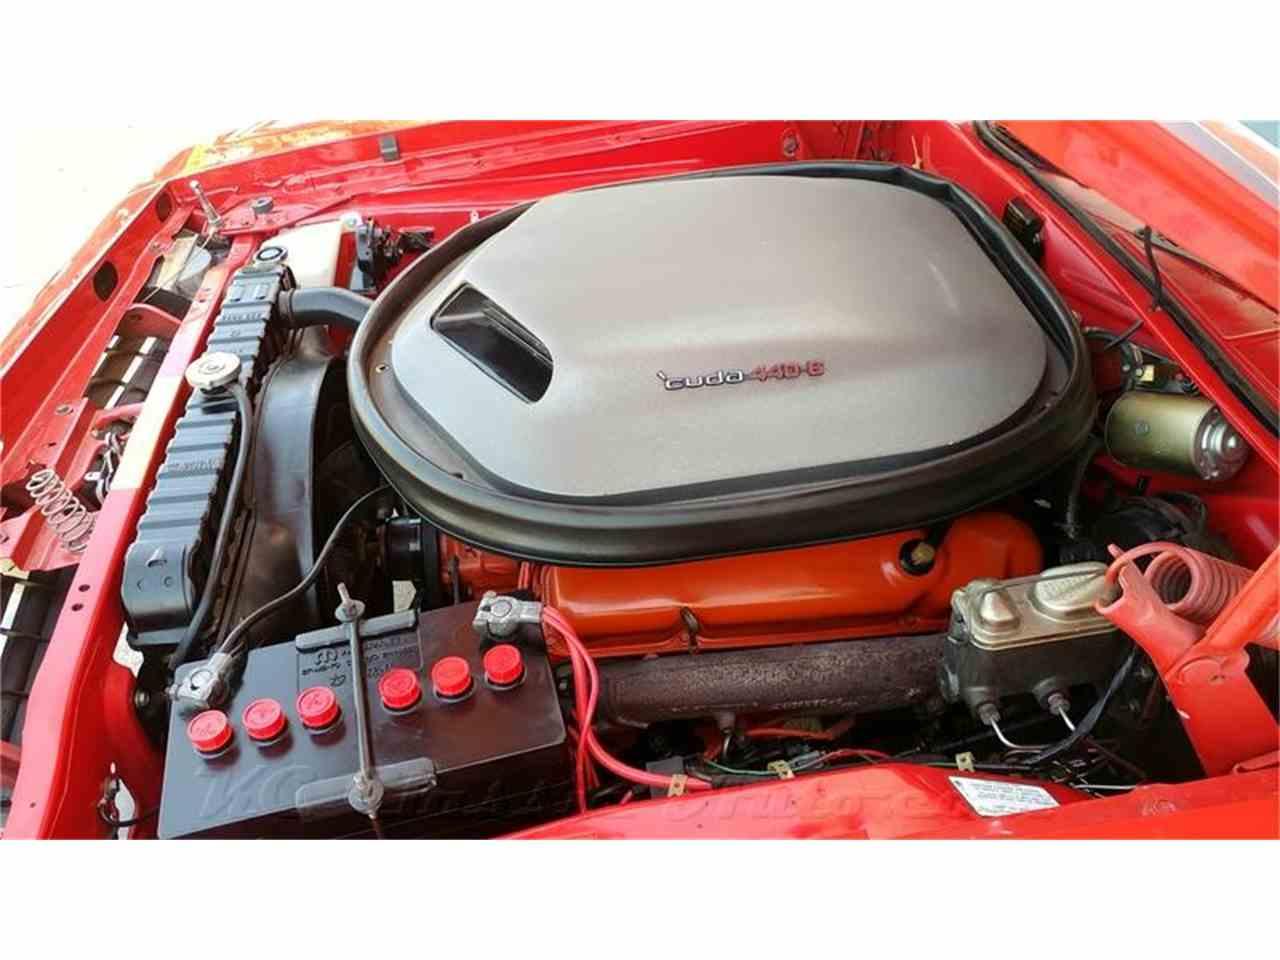 Large Picture of '70 Cuda 440-6 Pack V Code 4spd, Rotisserie Restored - FUHG